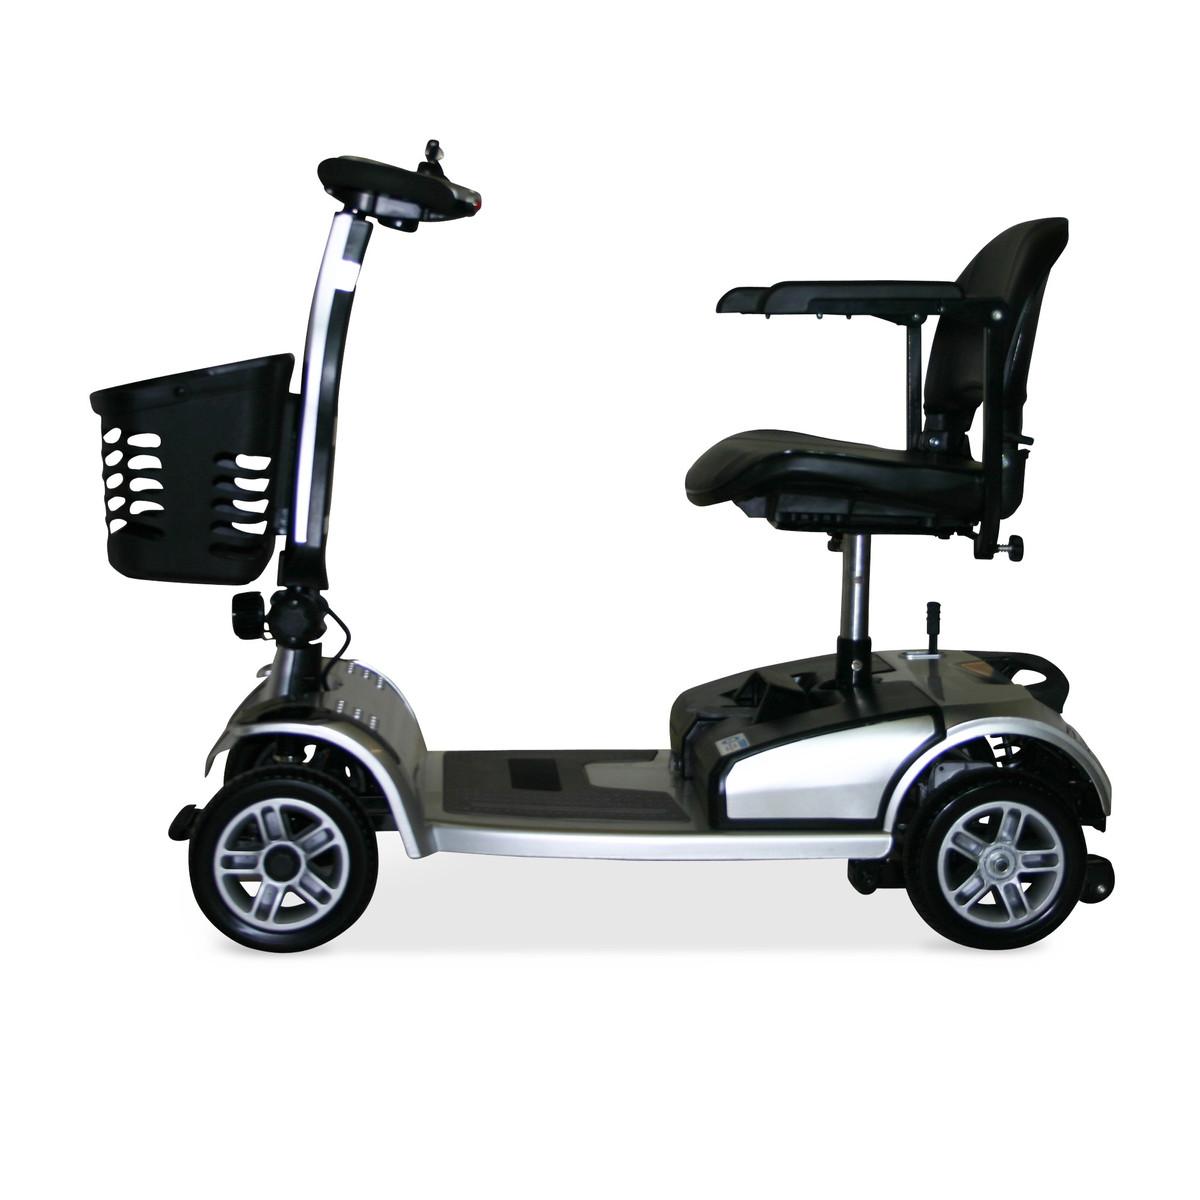 TBY-2000 Seniorenmobil Mobilitätsfahrzeug PREMIUM